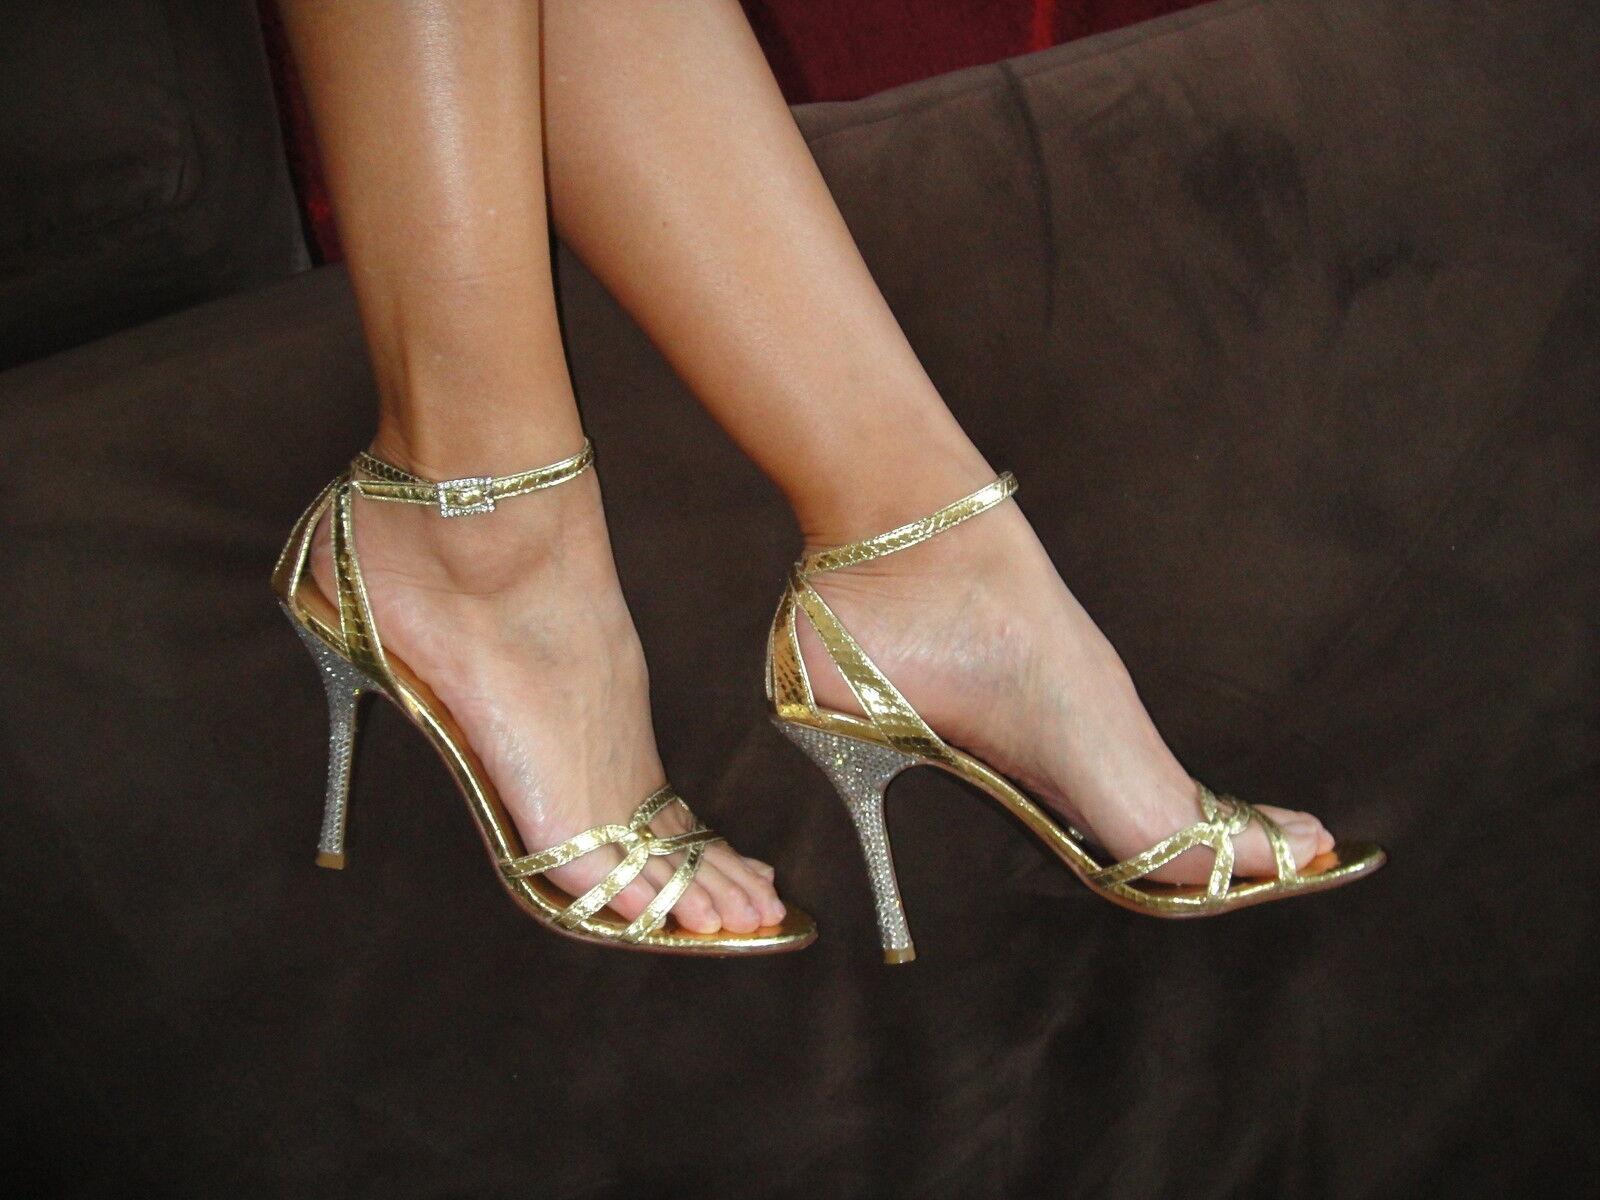 Bebe Gold Snakeskin Silver Rhinestone Crystal Heel Sandales Schuhes 9 9.5 275 Prom